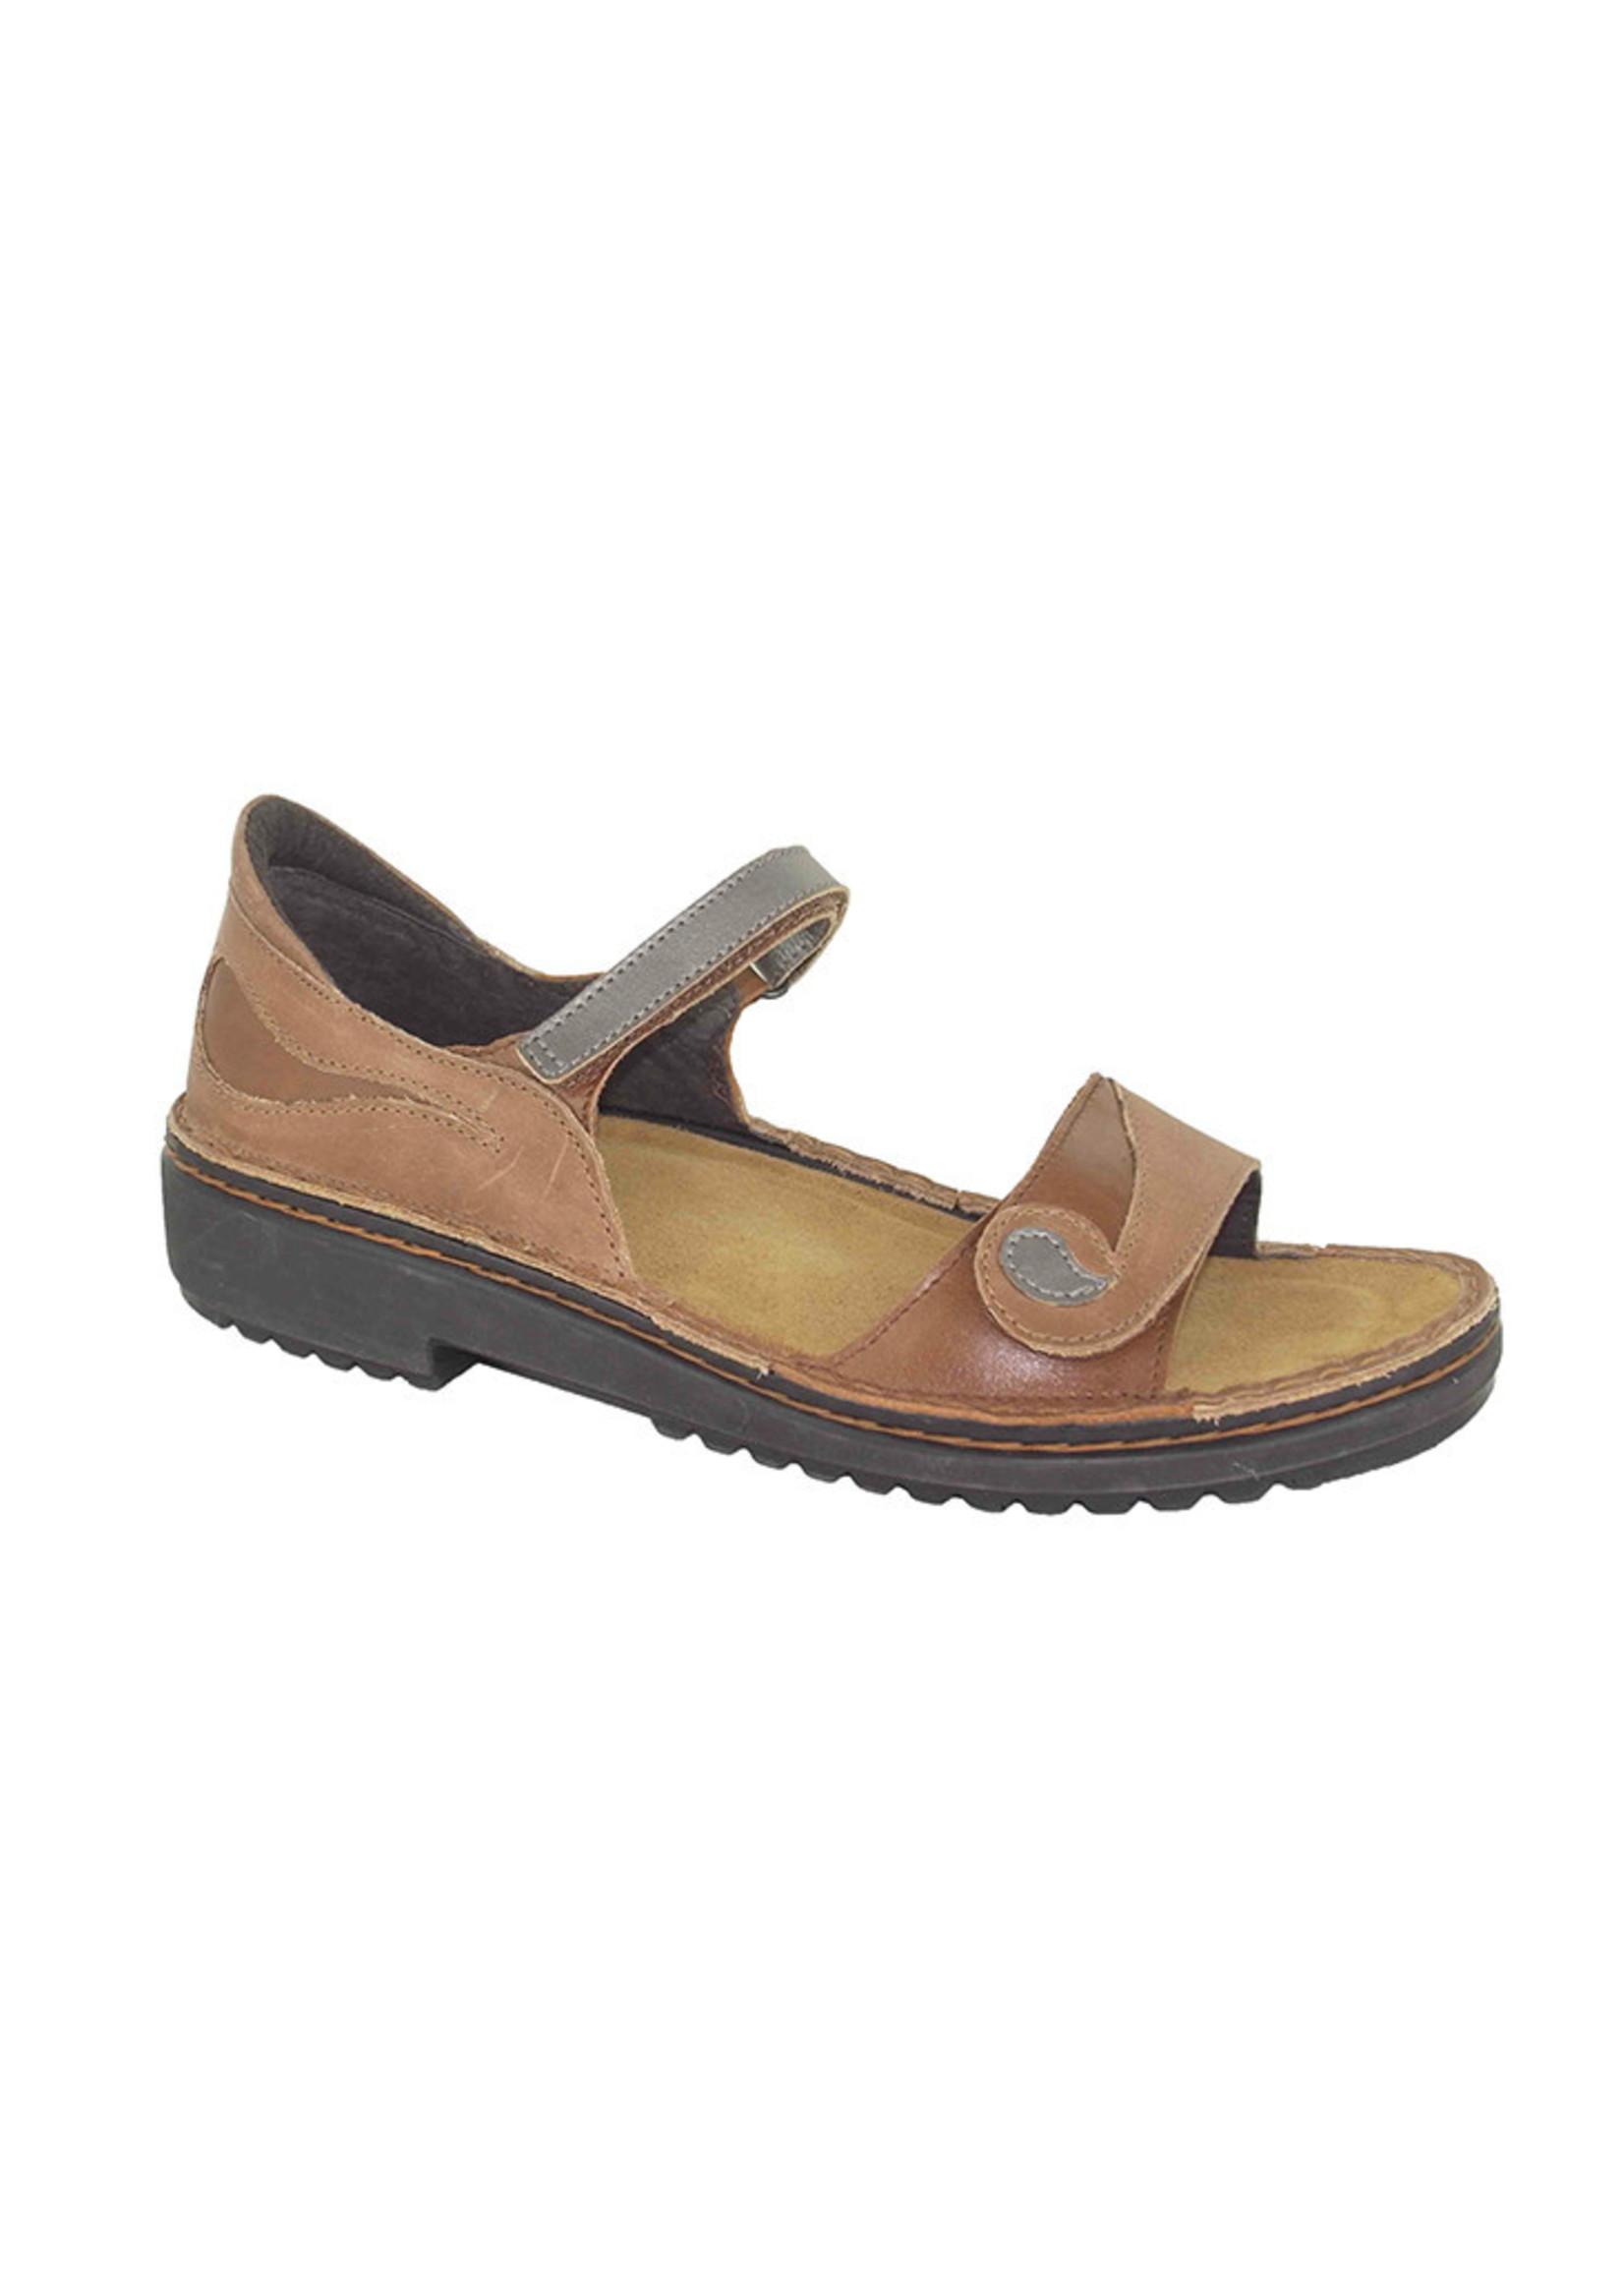 Naot Footwear Yolanda in Latte Brown Combo